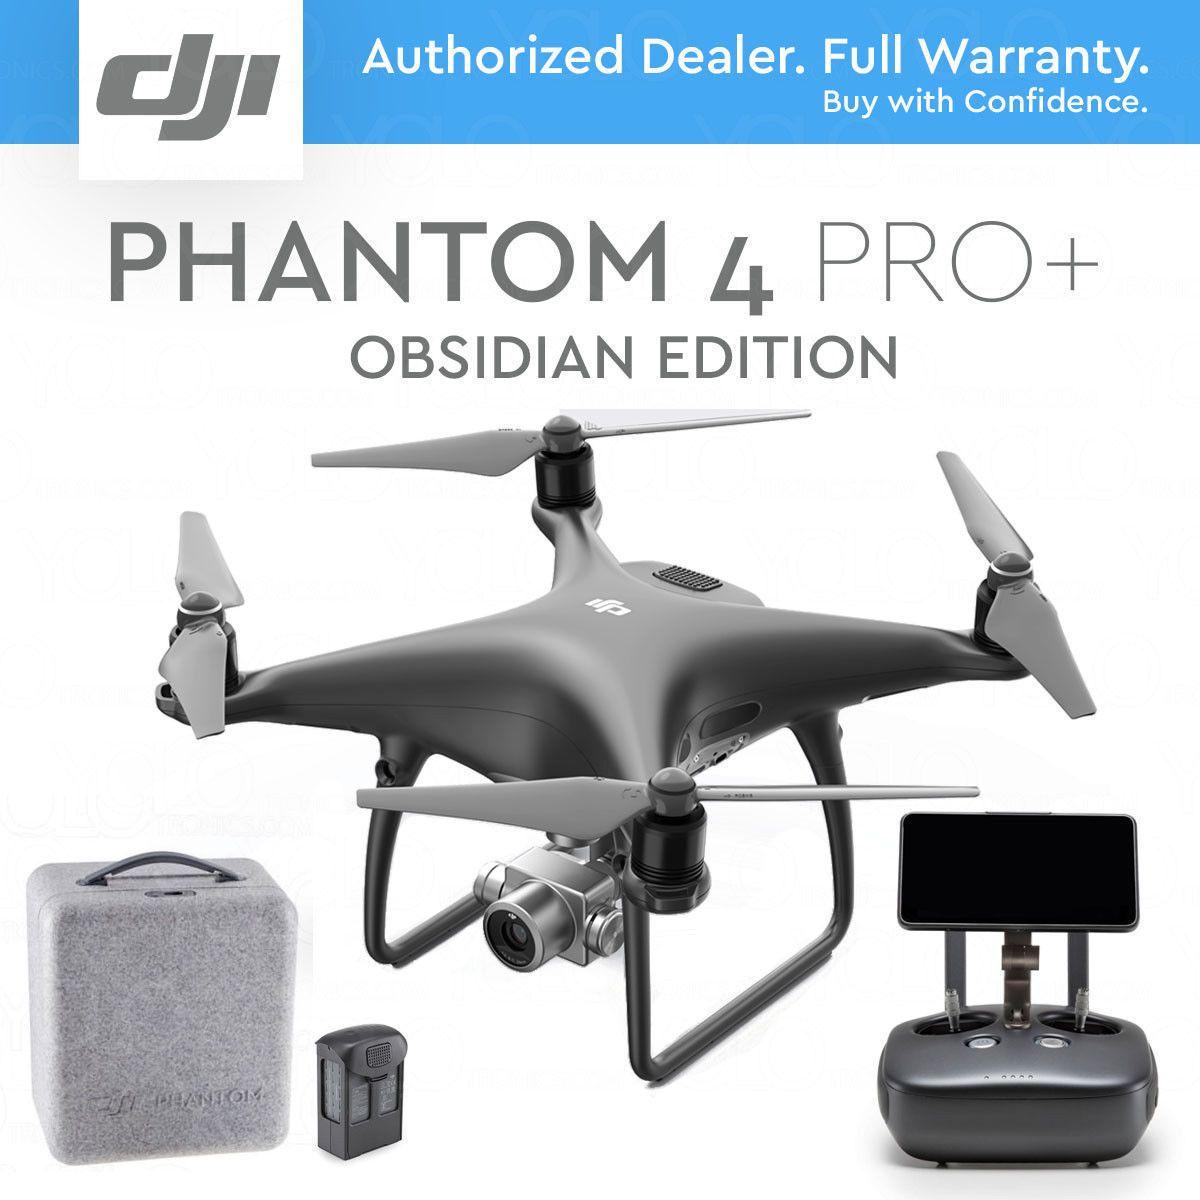 Dji Phantom 4 Pro Plus Drone 4k 20mp 5 5 Display Black Obsidian Edition Dji Phantom 4 Drone Dji Phantom